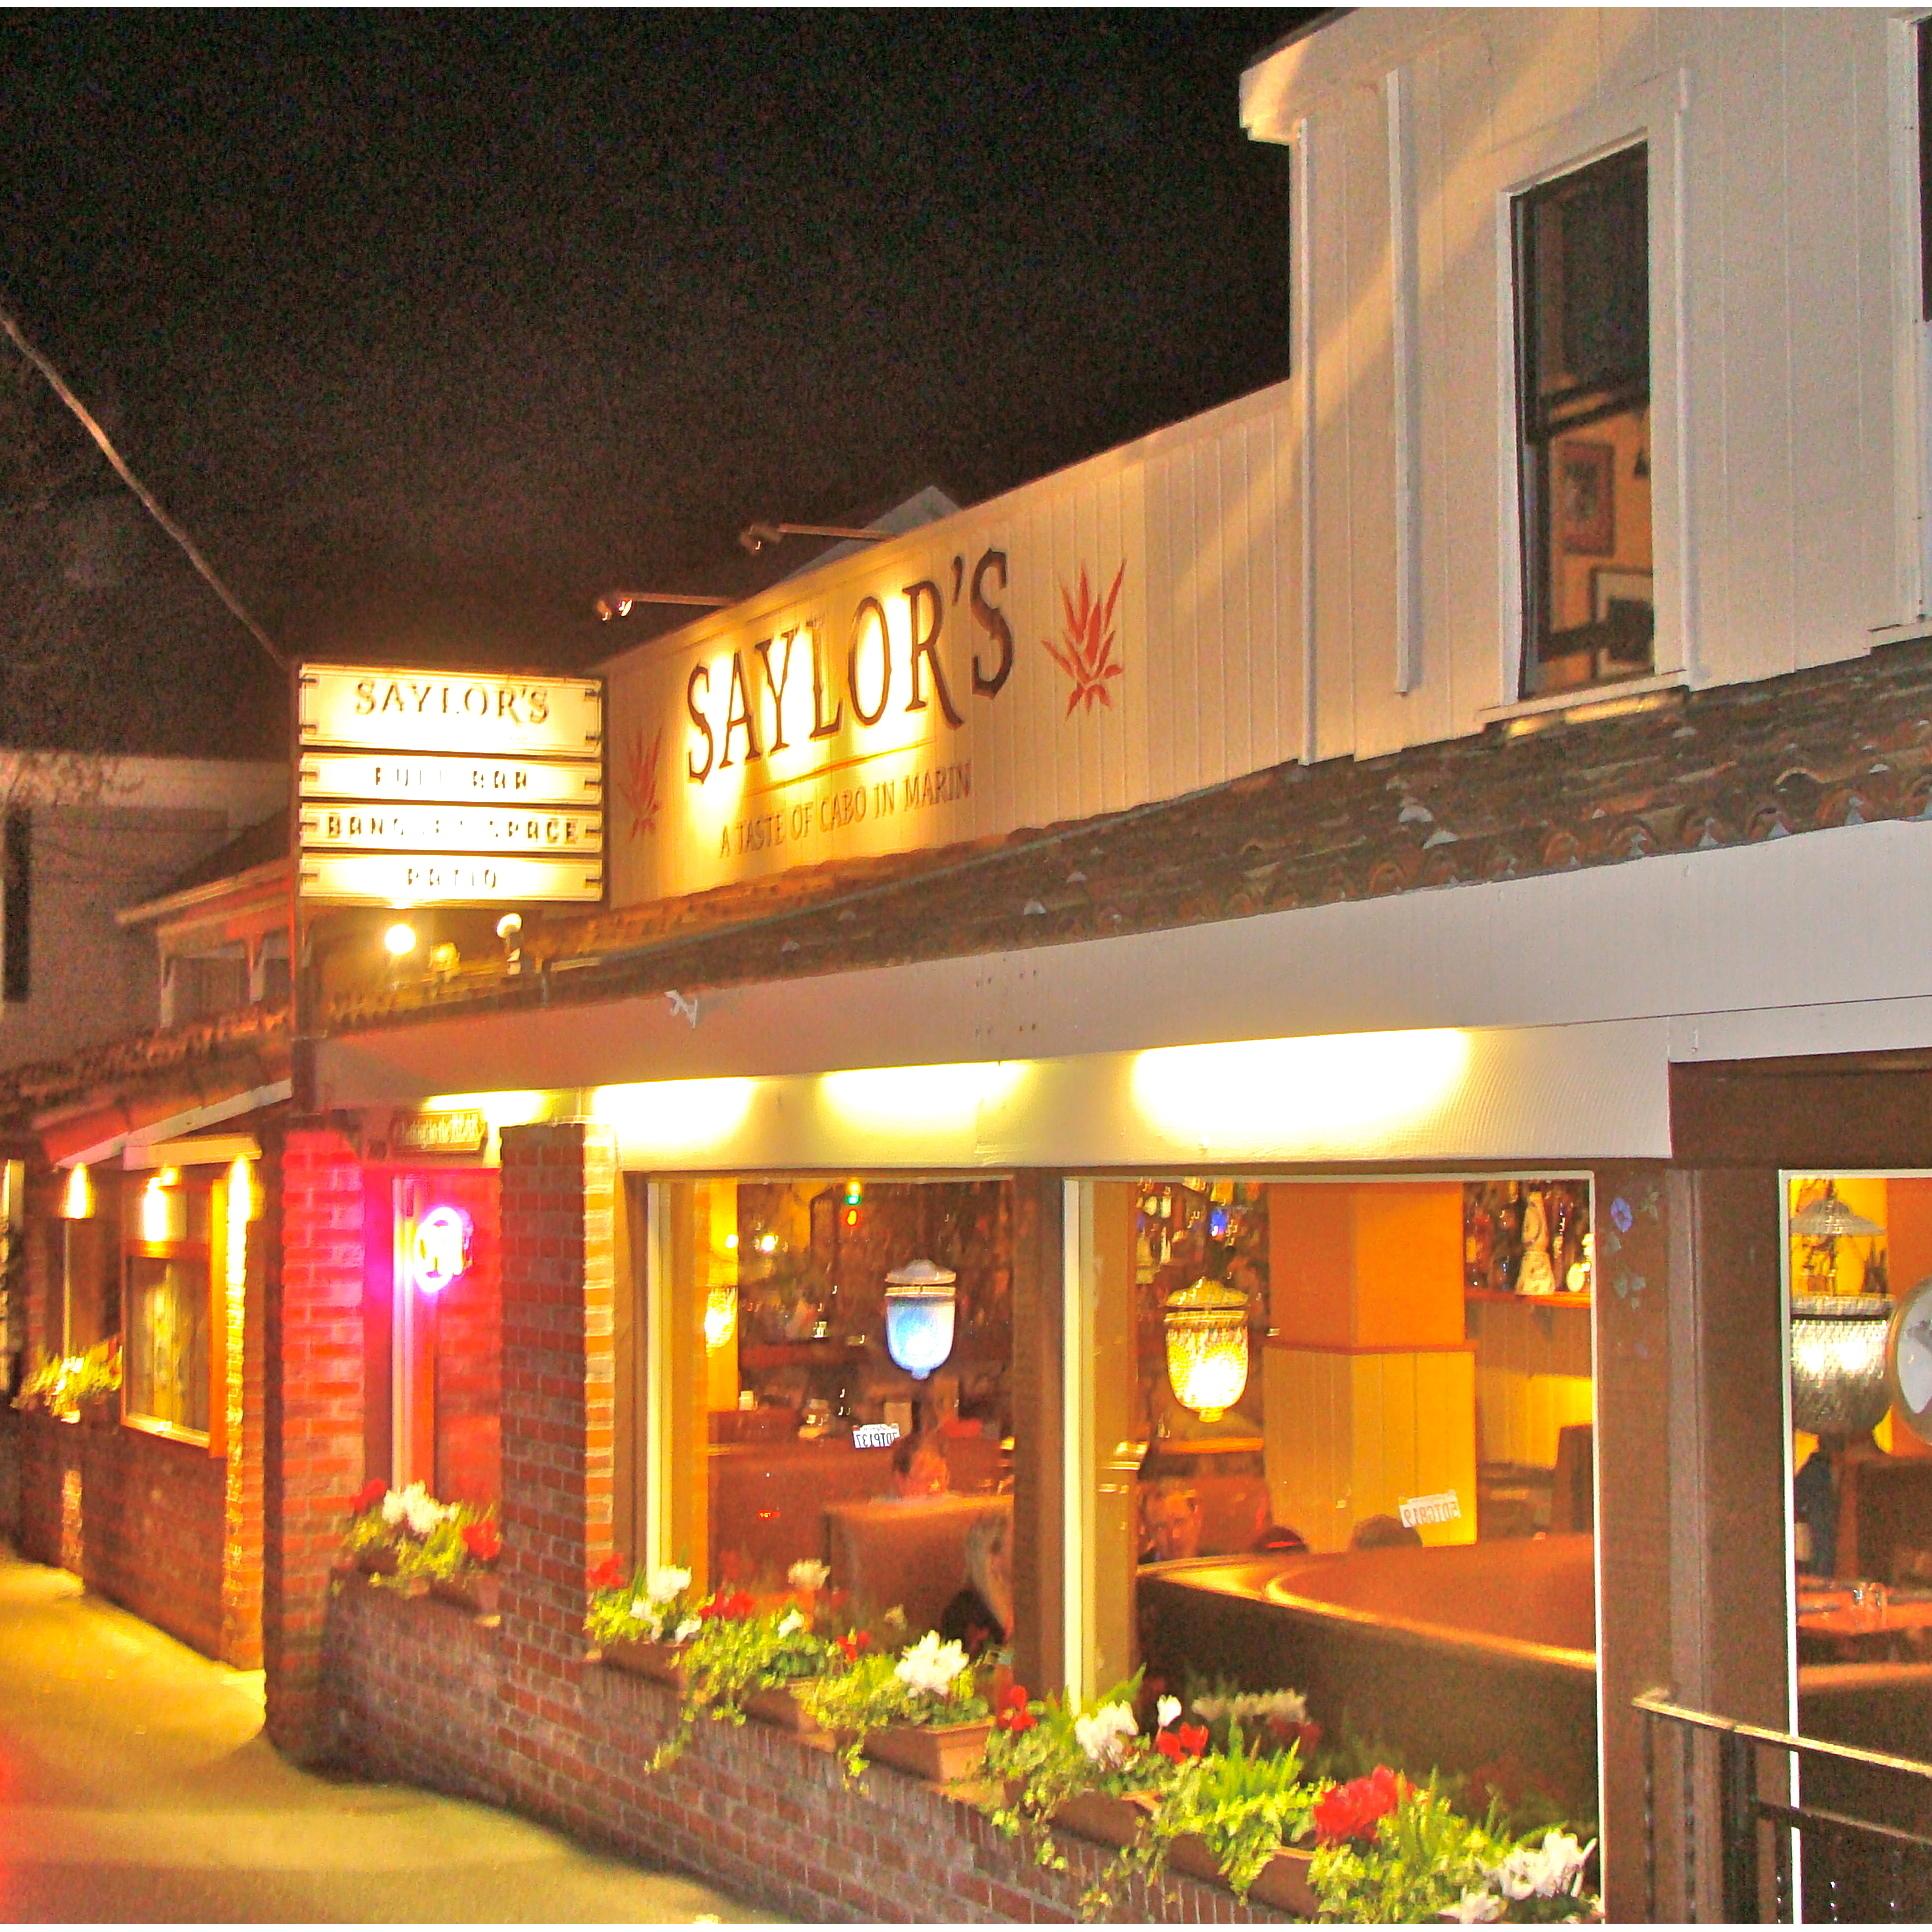 Italian Foods Near Me: Saylor's Restaurant & Bar Coupons Near Me In Sausalito, CA